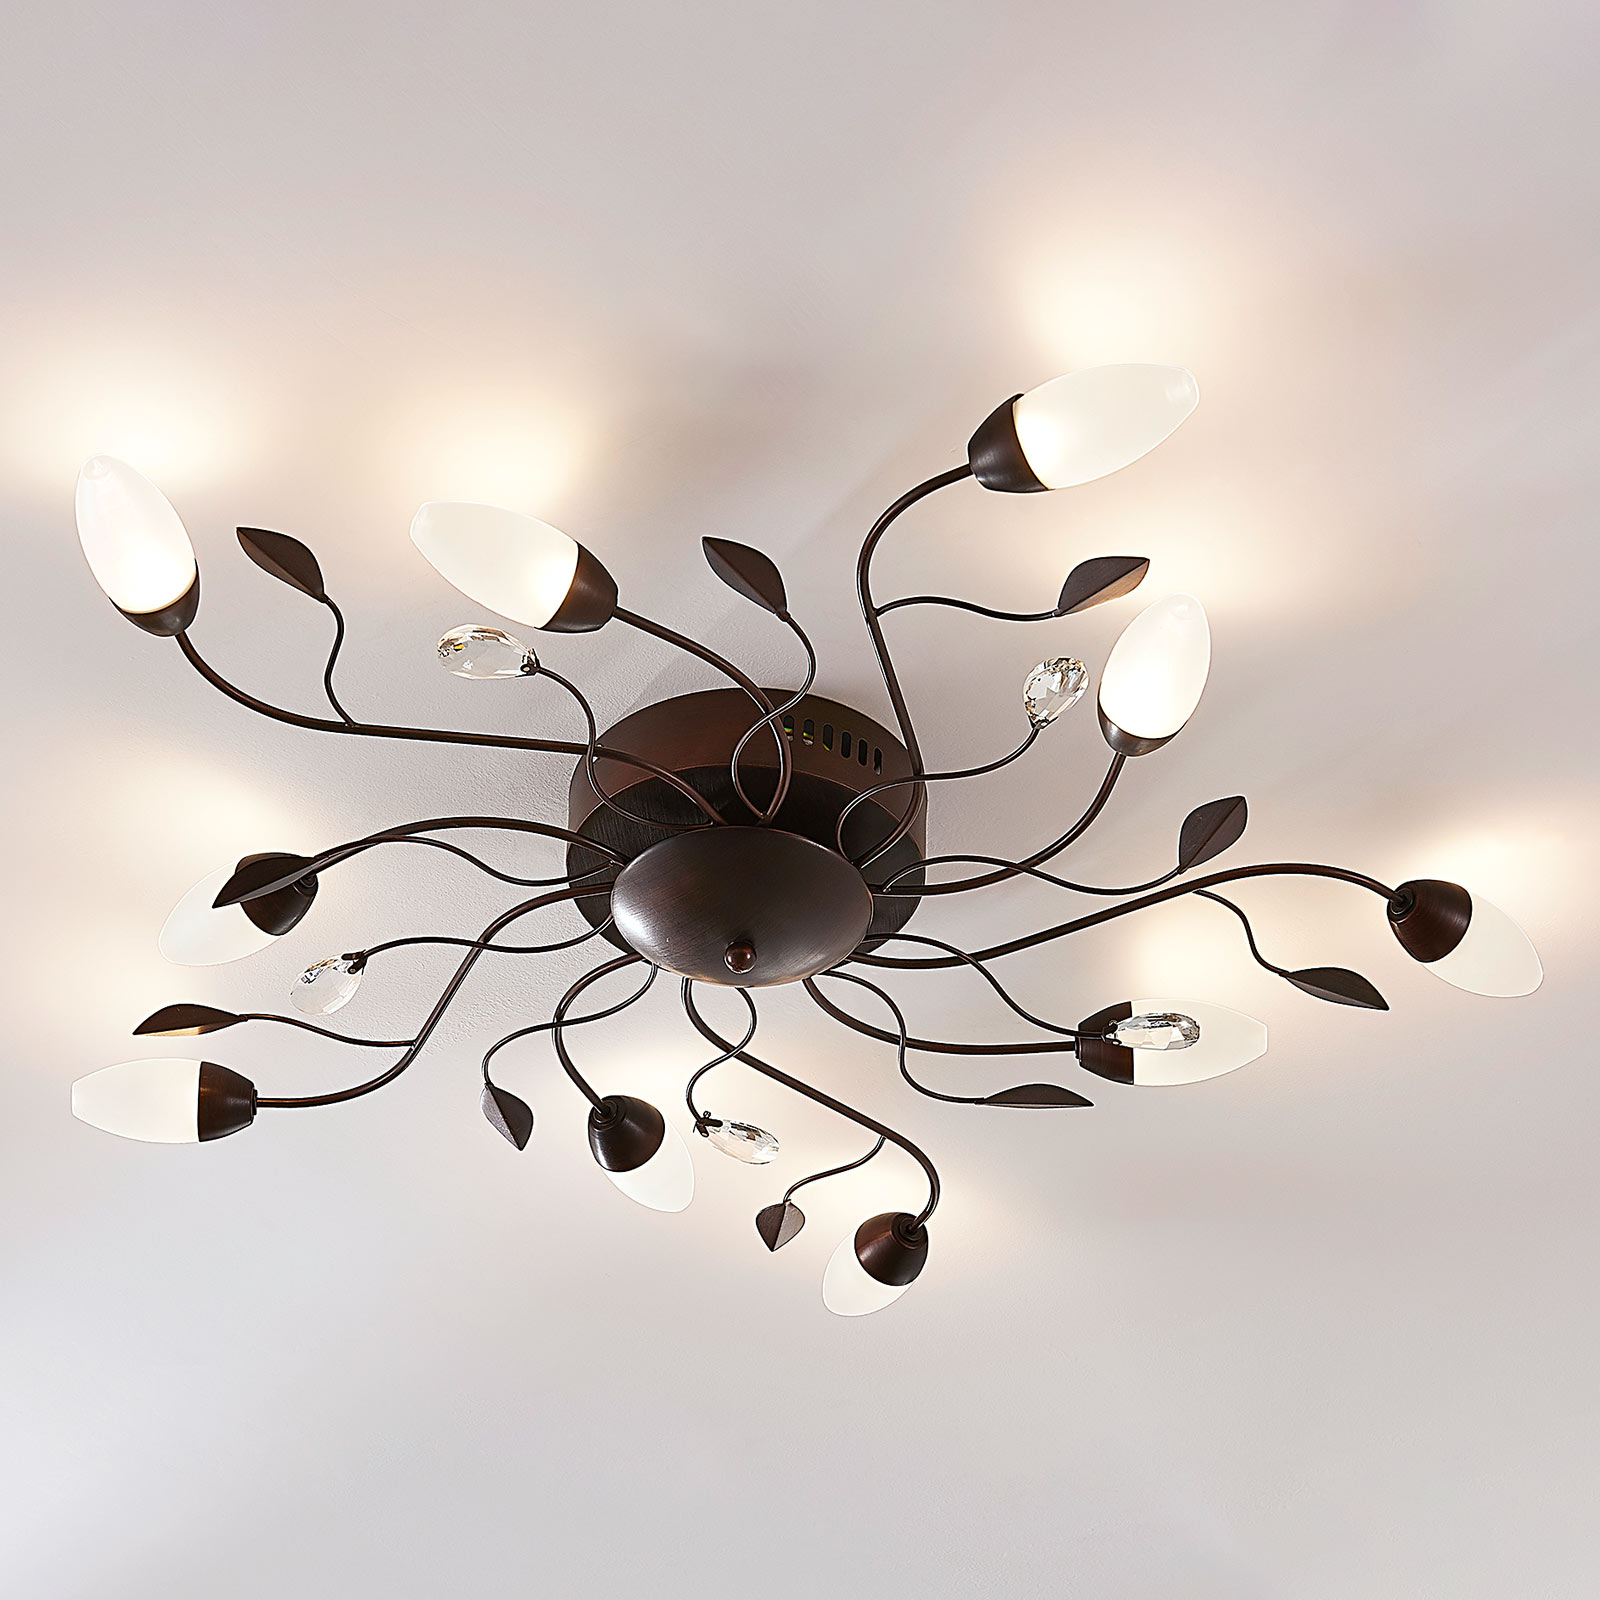 LED plafondlamp Renato, 10 lampen, dimb.